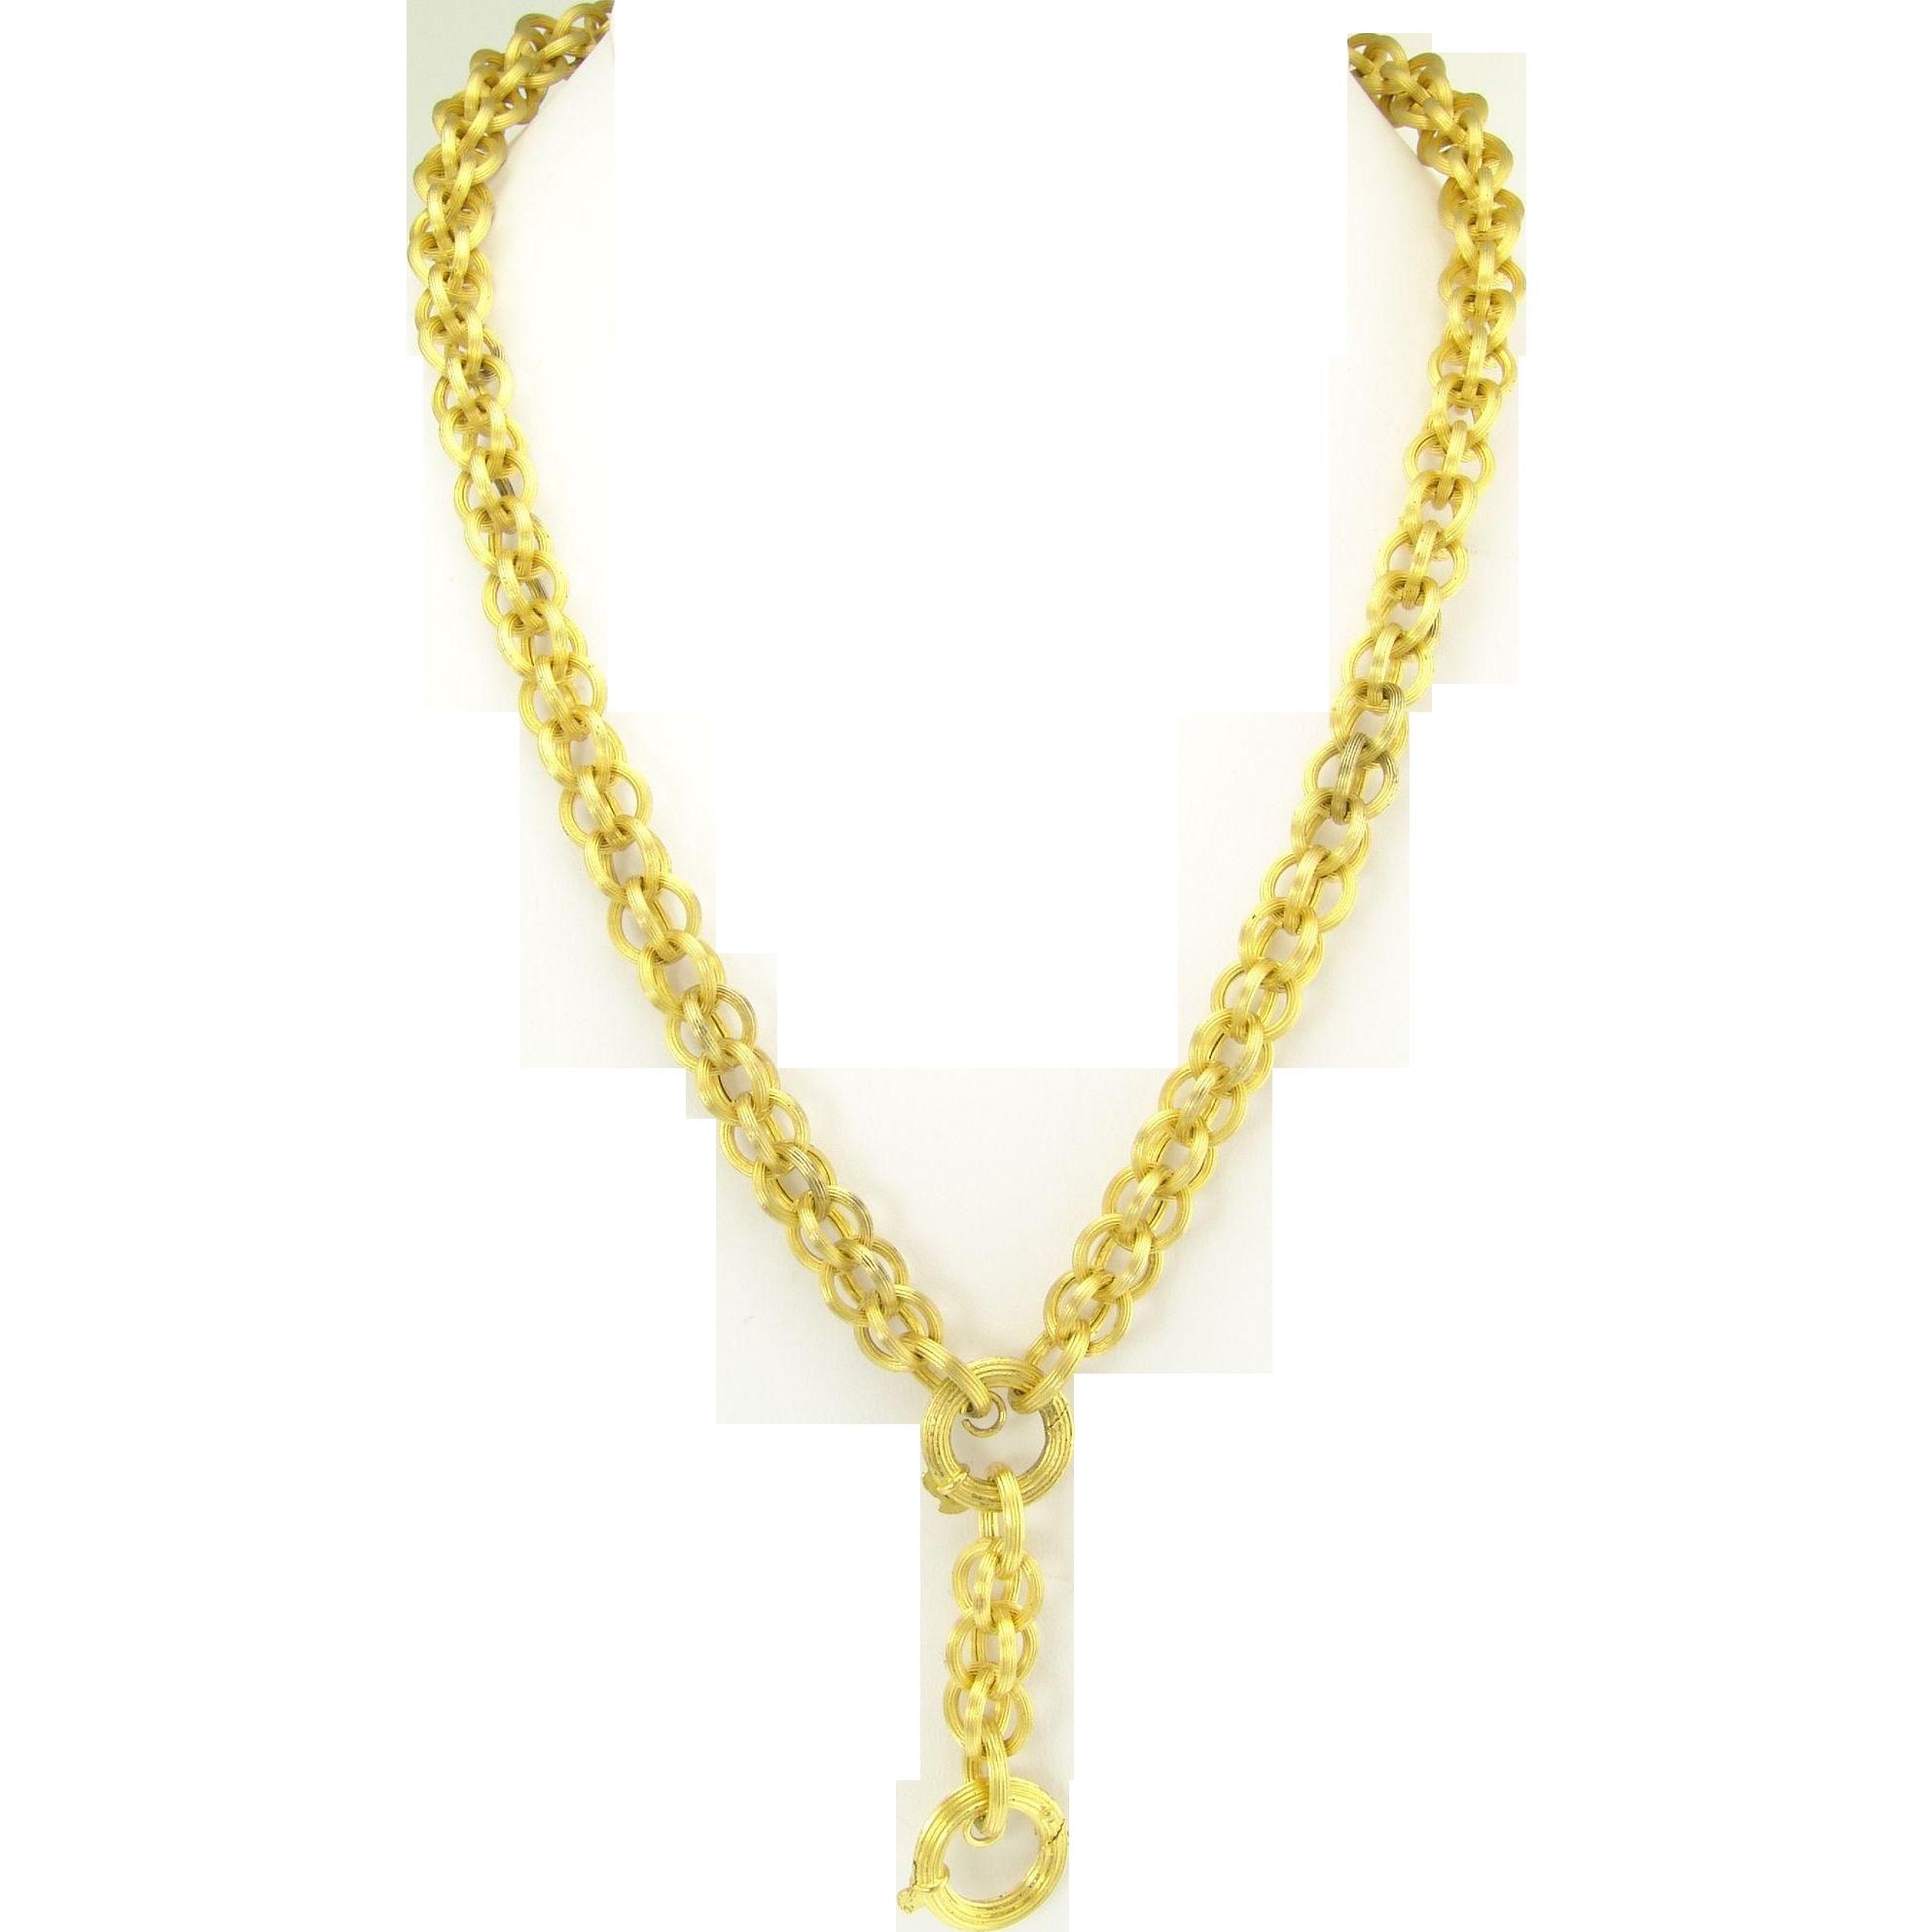 Jewelry gold chain